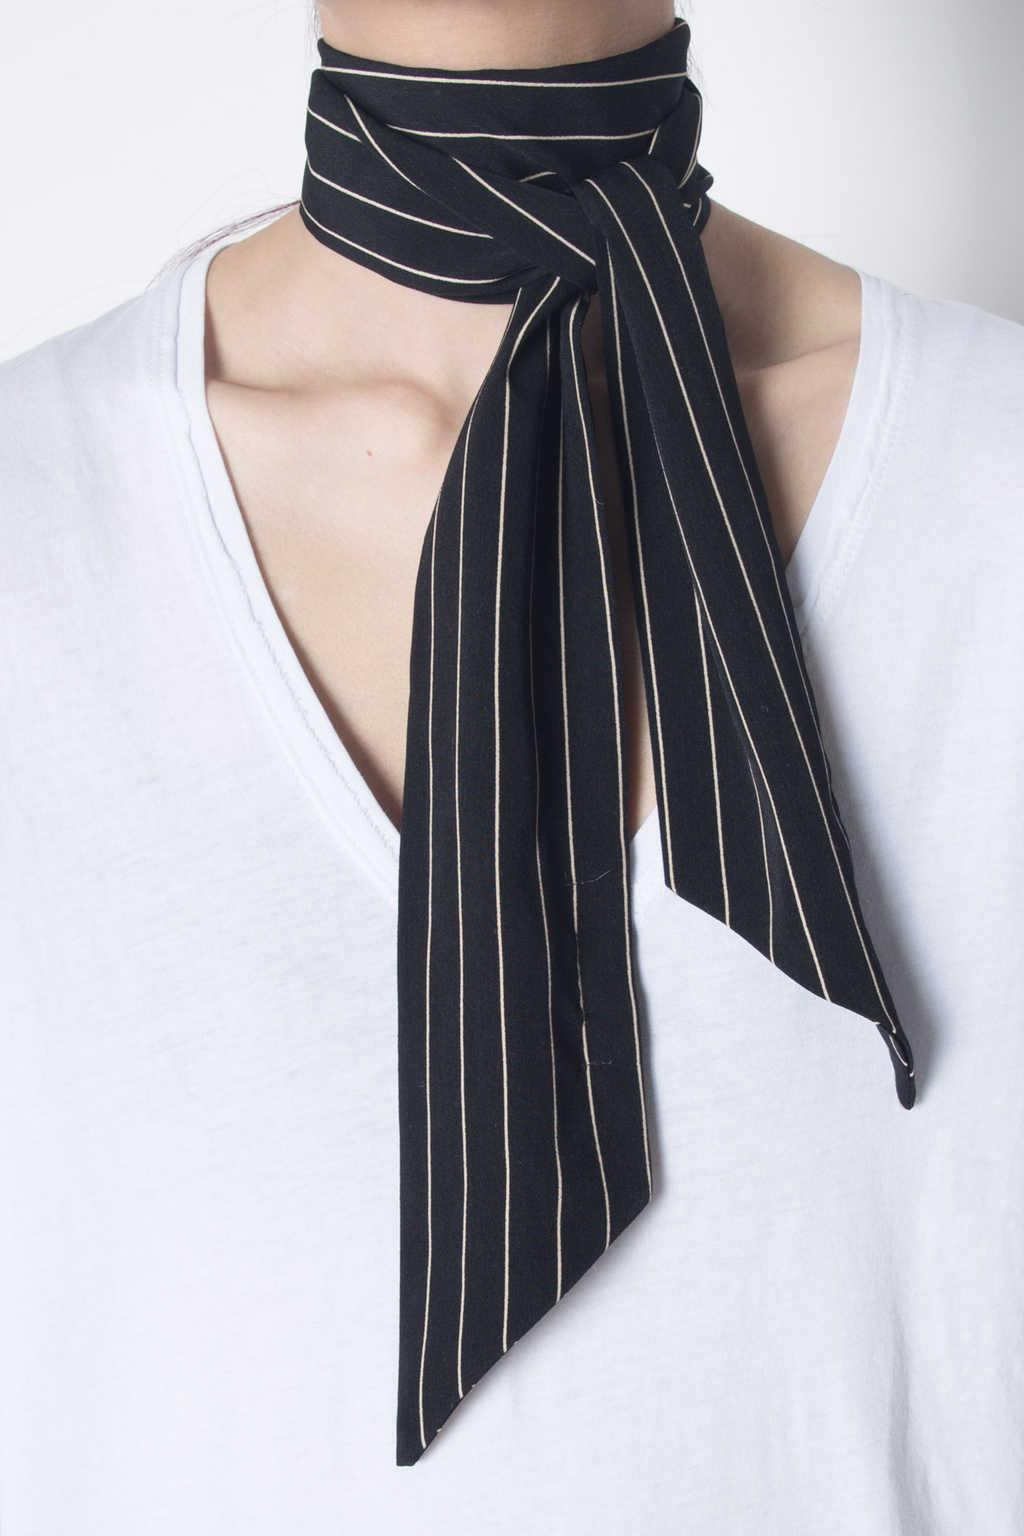 Scarf H015 Black 6